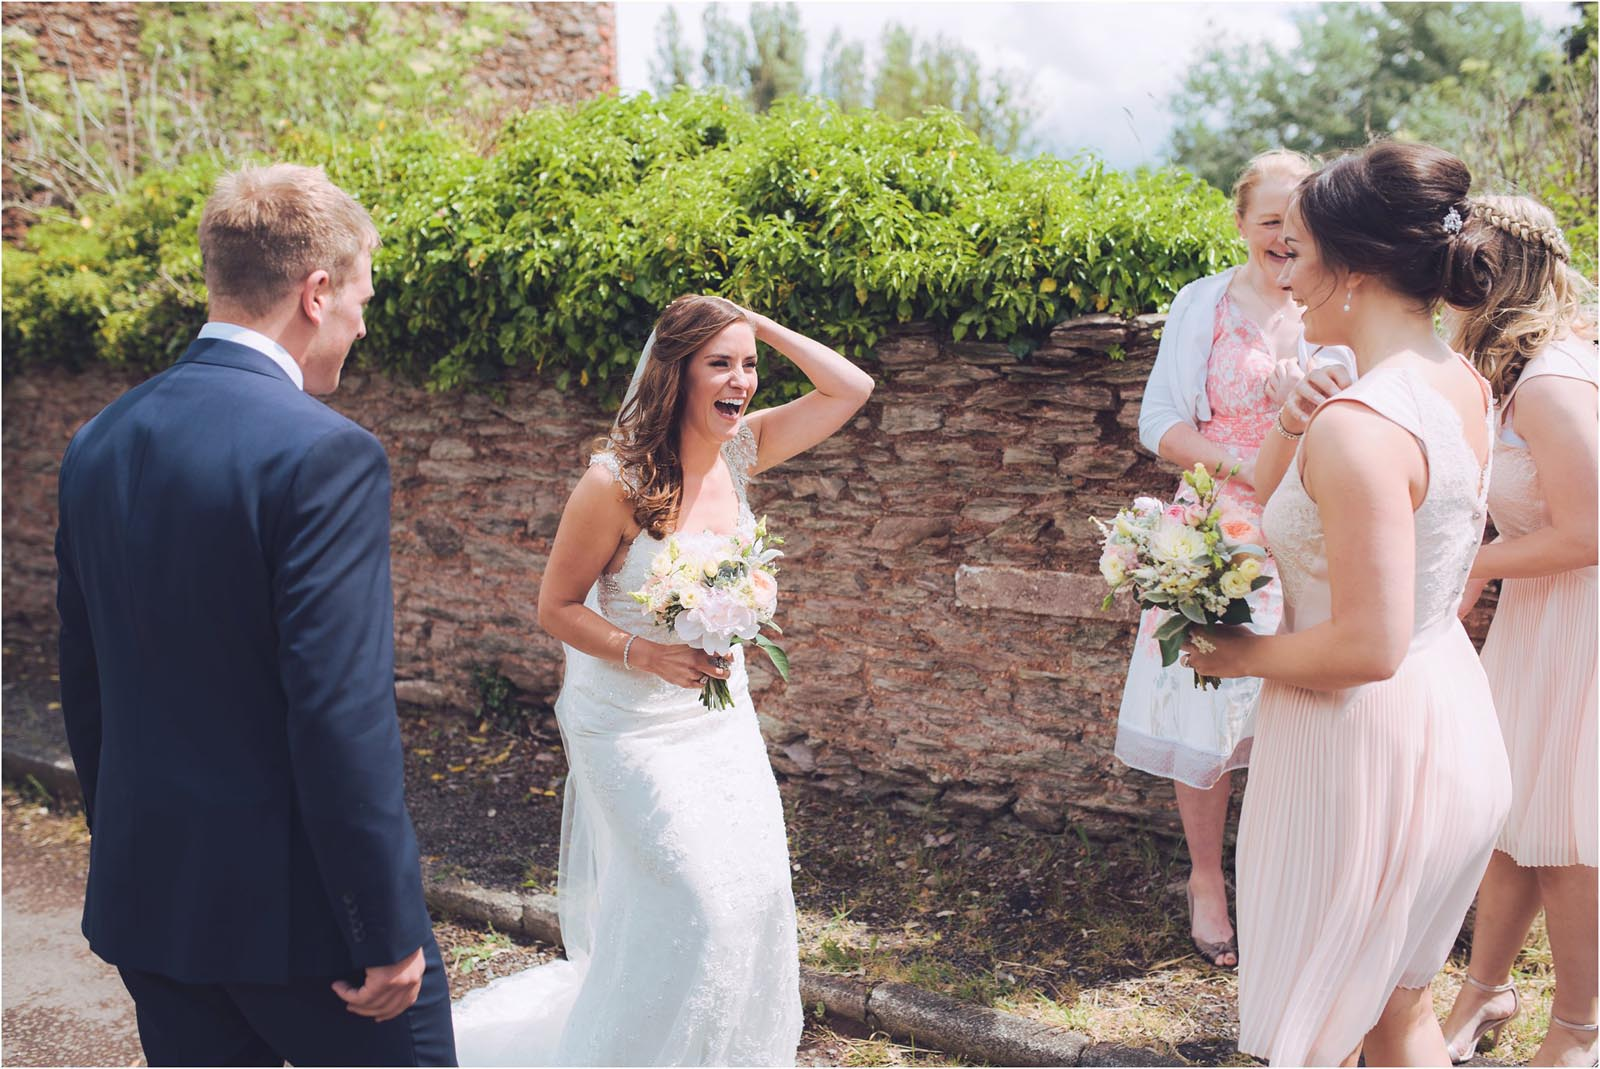 Simon biffen wedding photography 0071